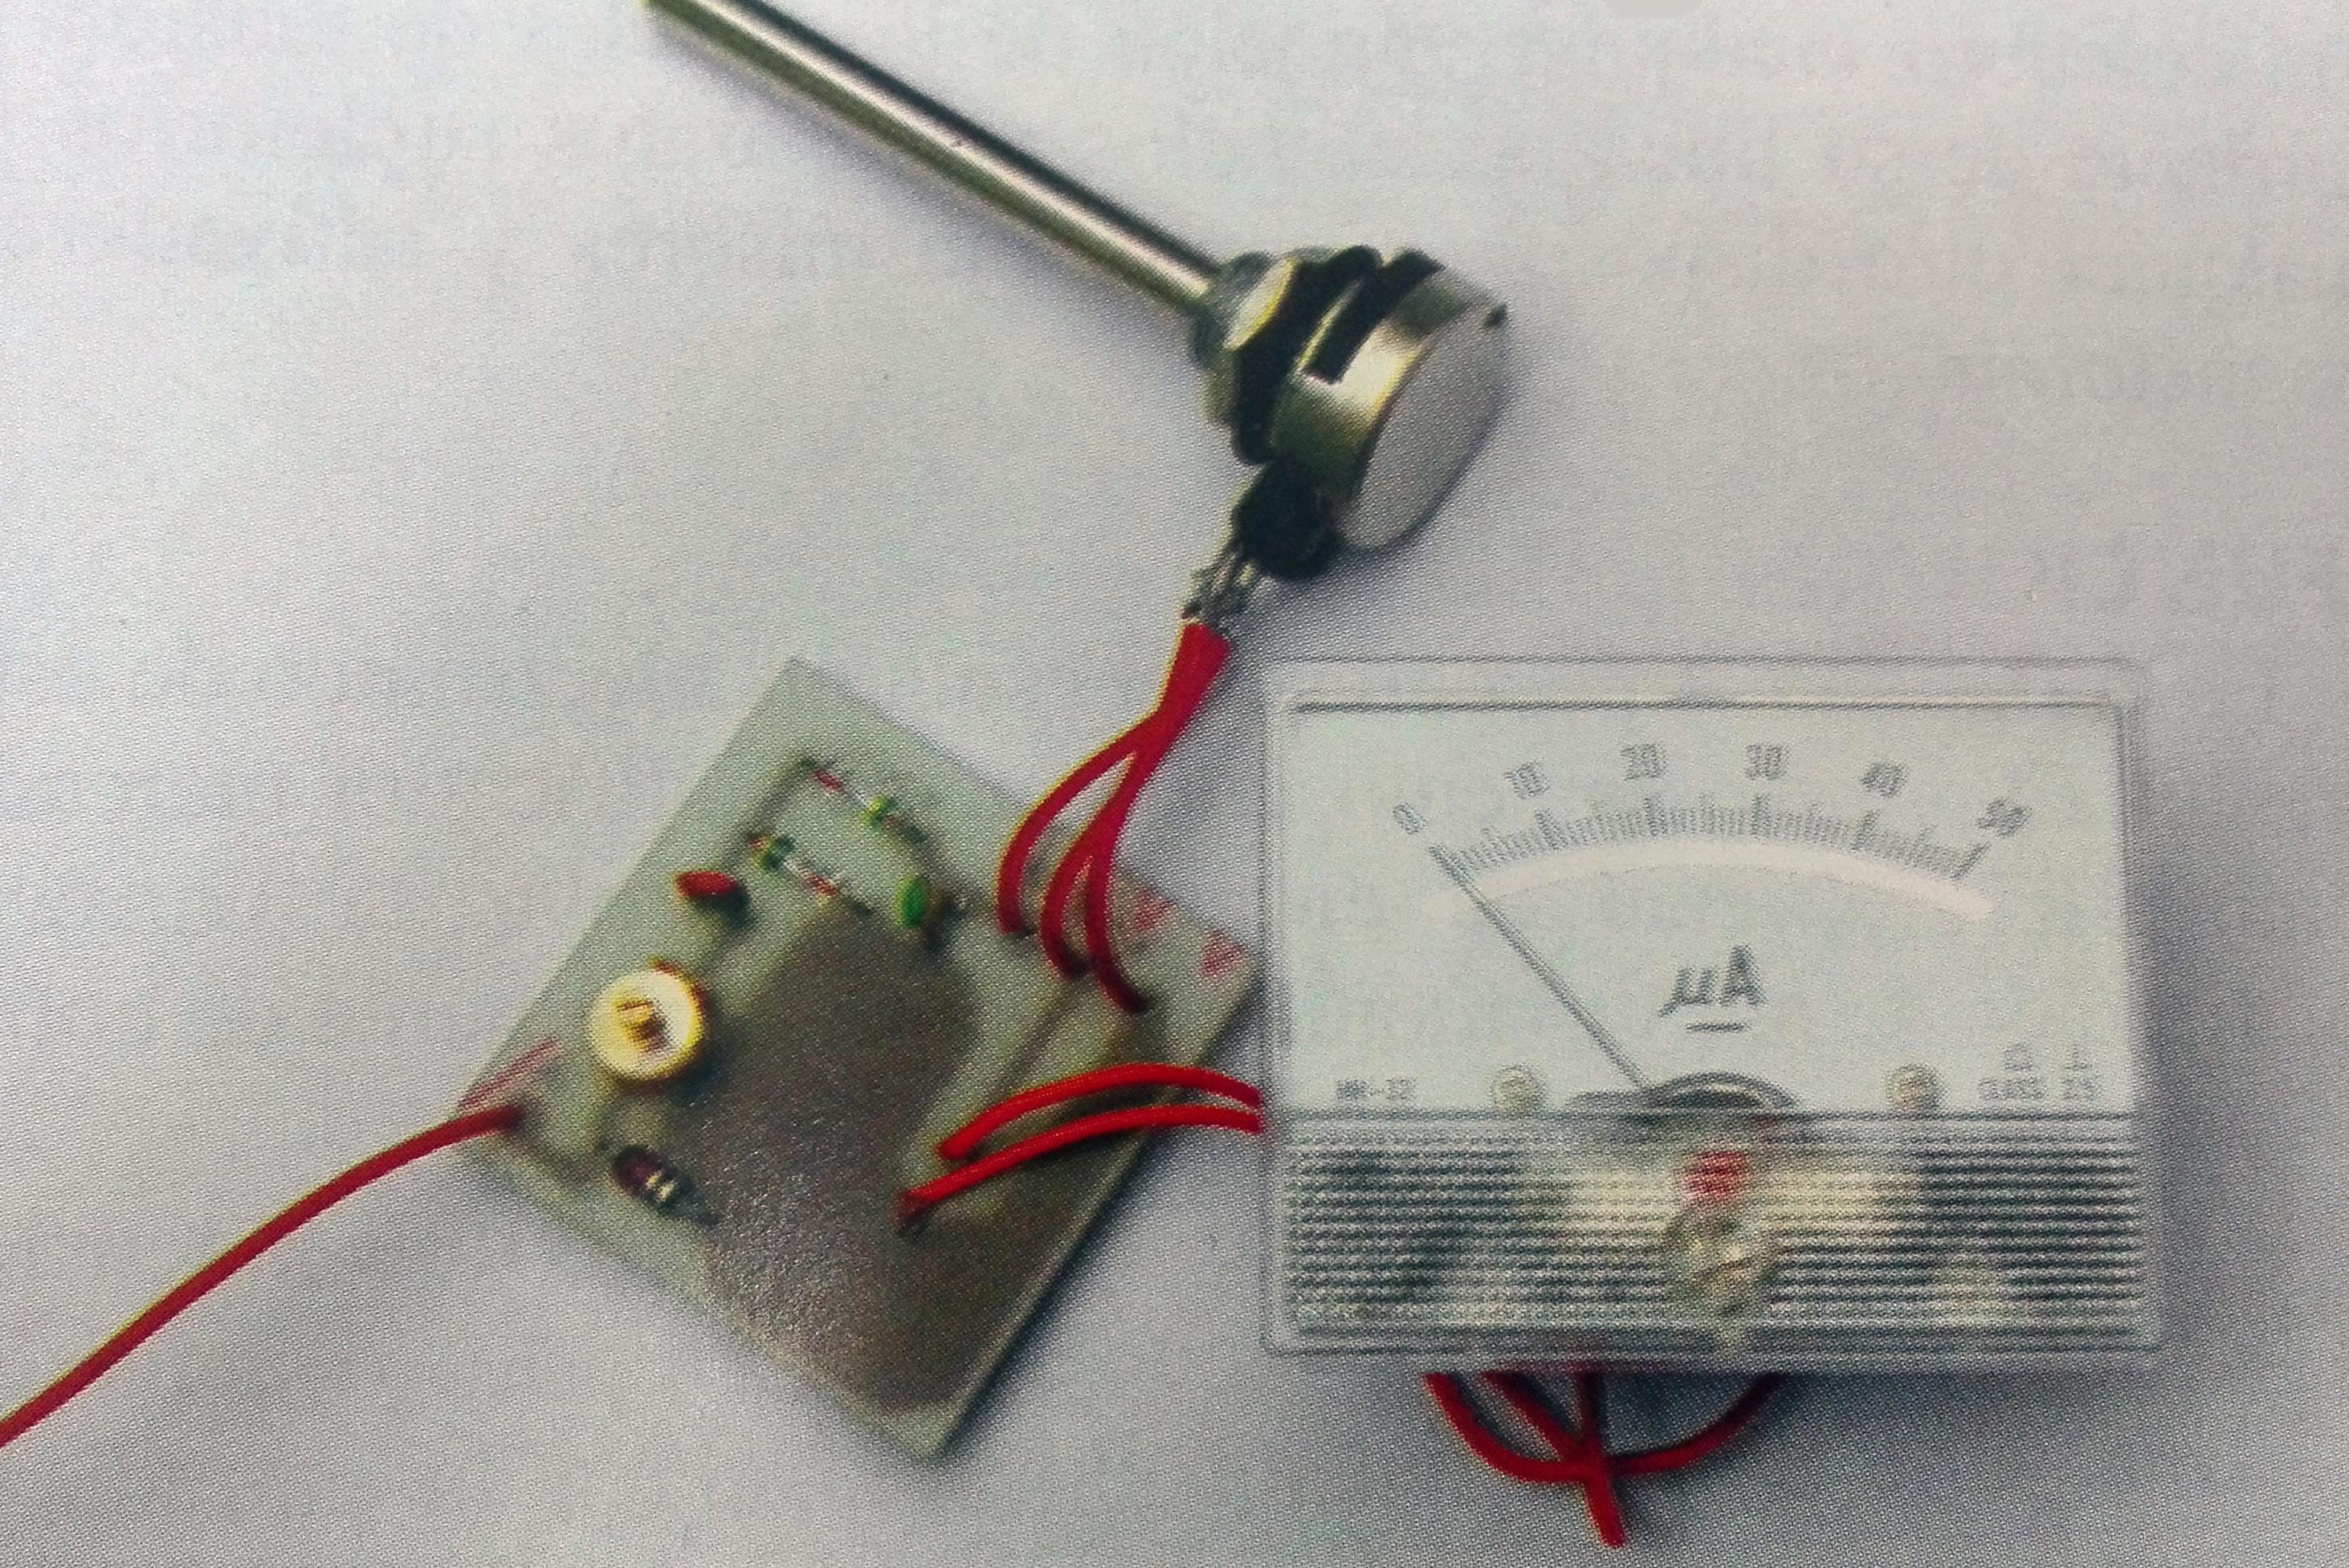 learn electronics todoelectronica